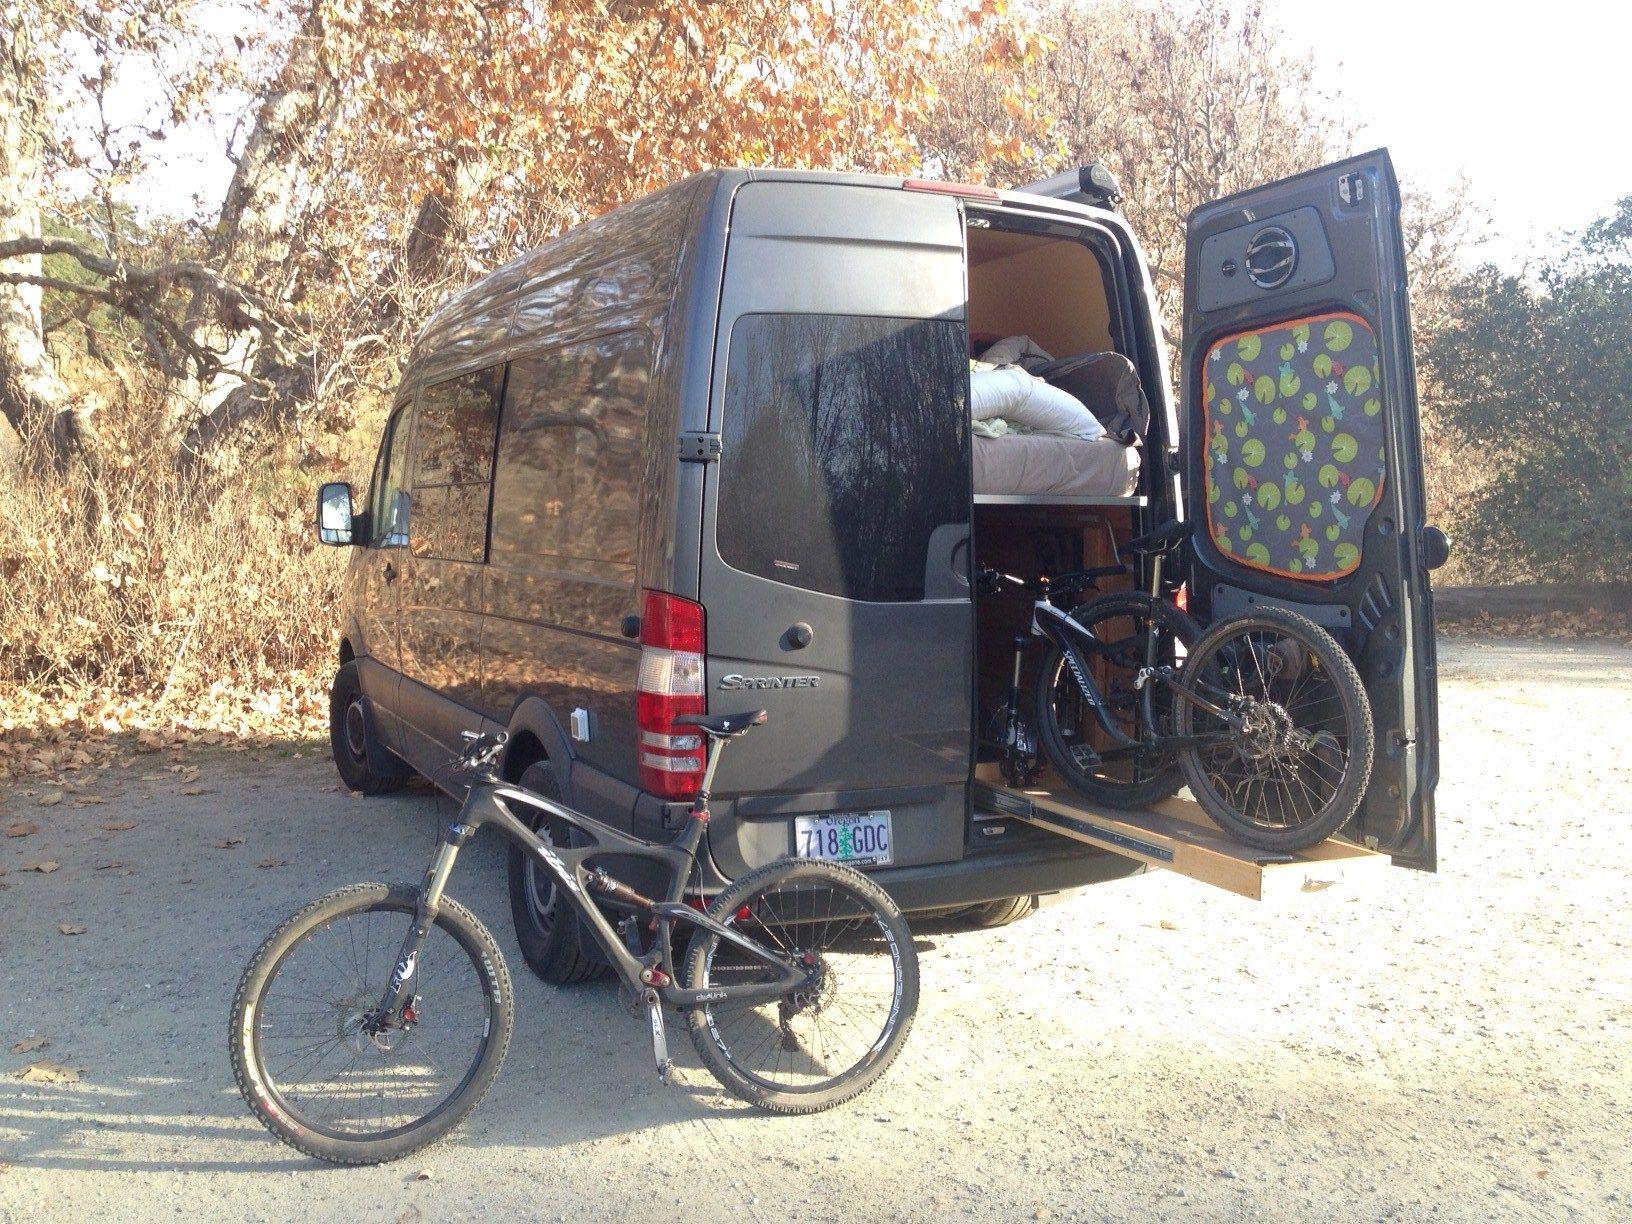 The Adventure Mobile